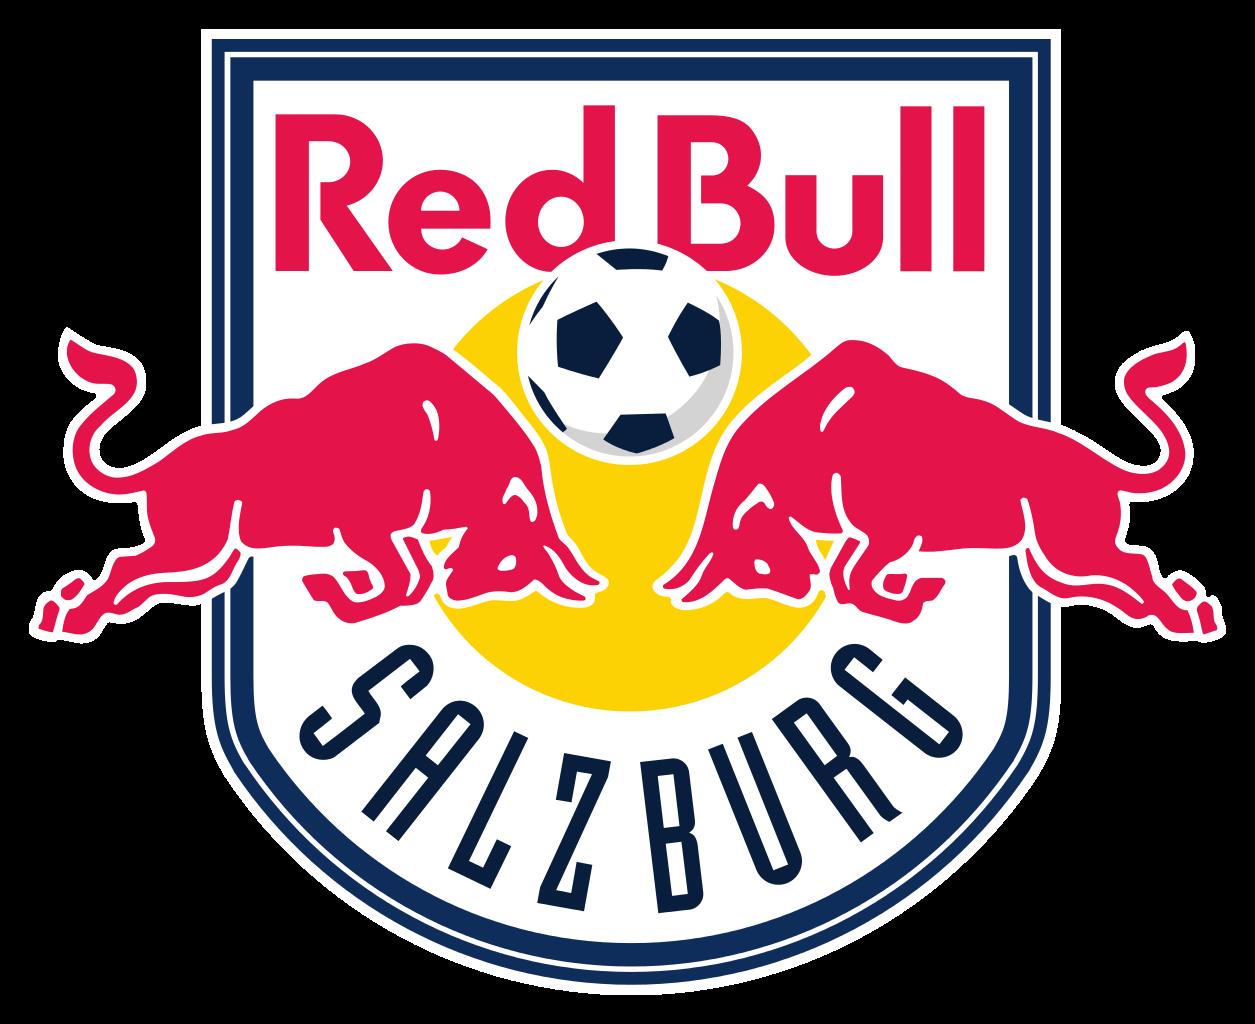 red bull salzburg png logo #2843